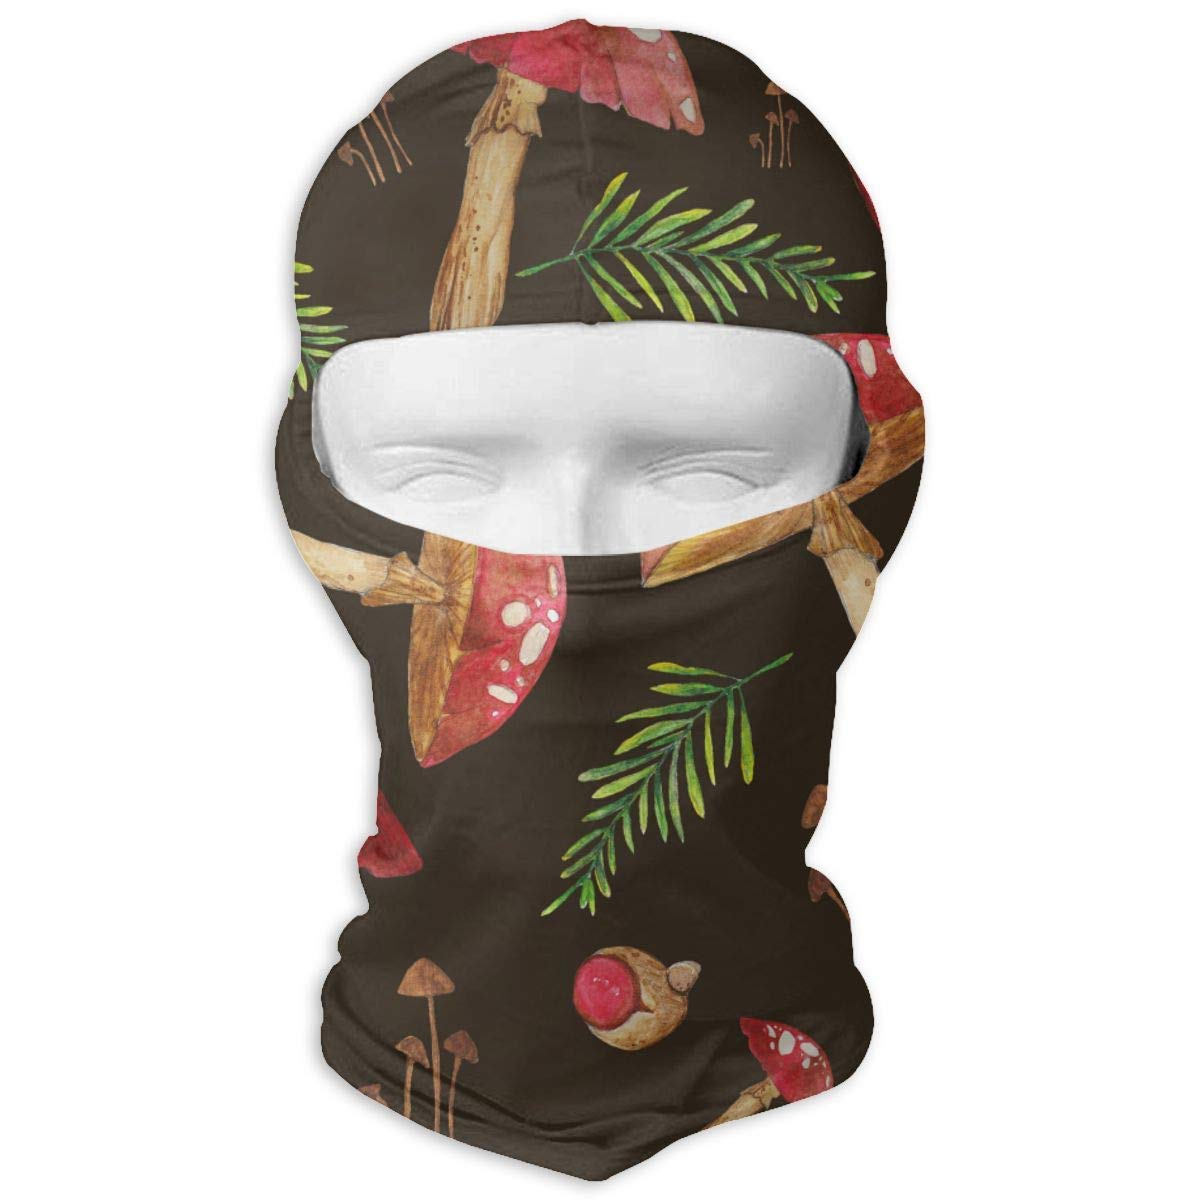 LJBBJL1 Mushroom Pattern Balaclava Face Mask Hood Outdoor Sport Hat for Ski,Cycling,Motorcycling,Climbing